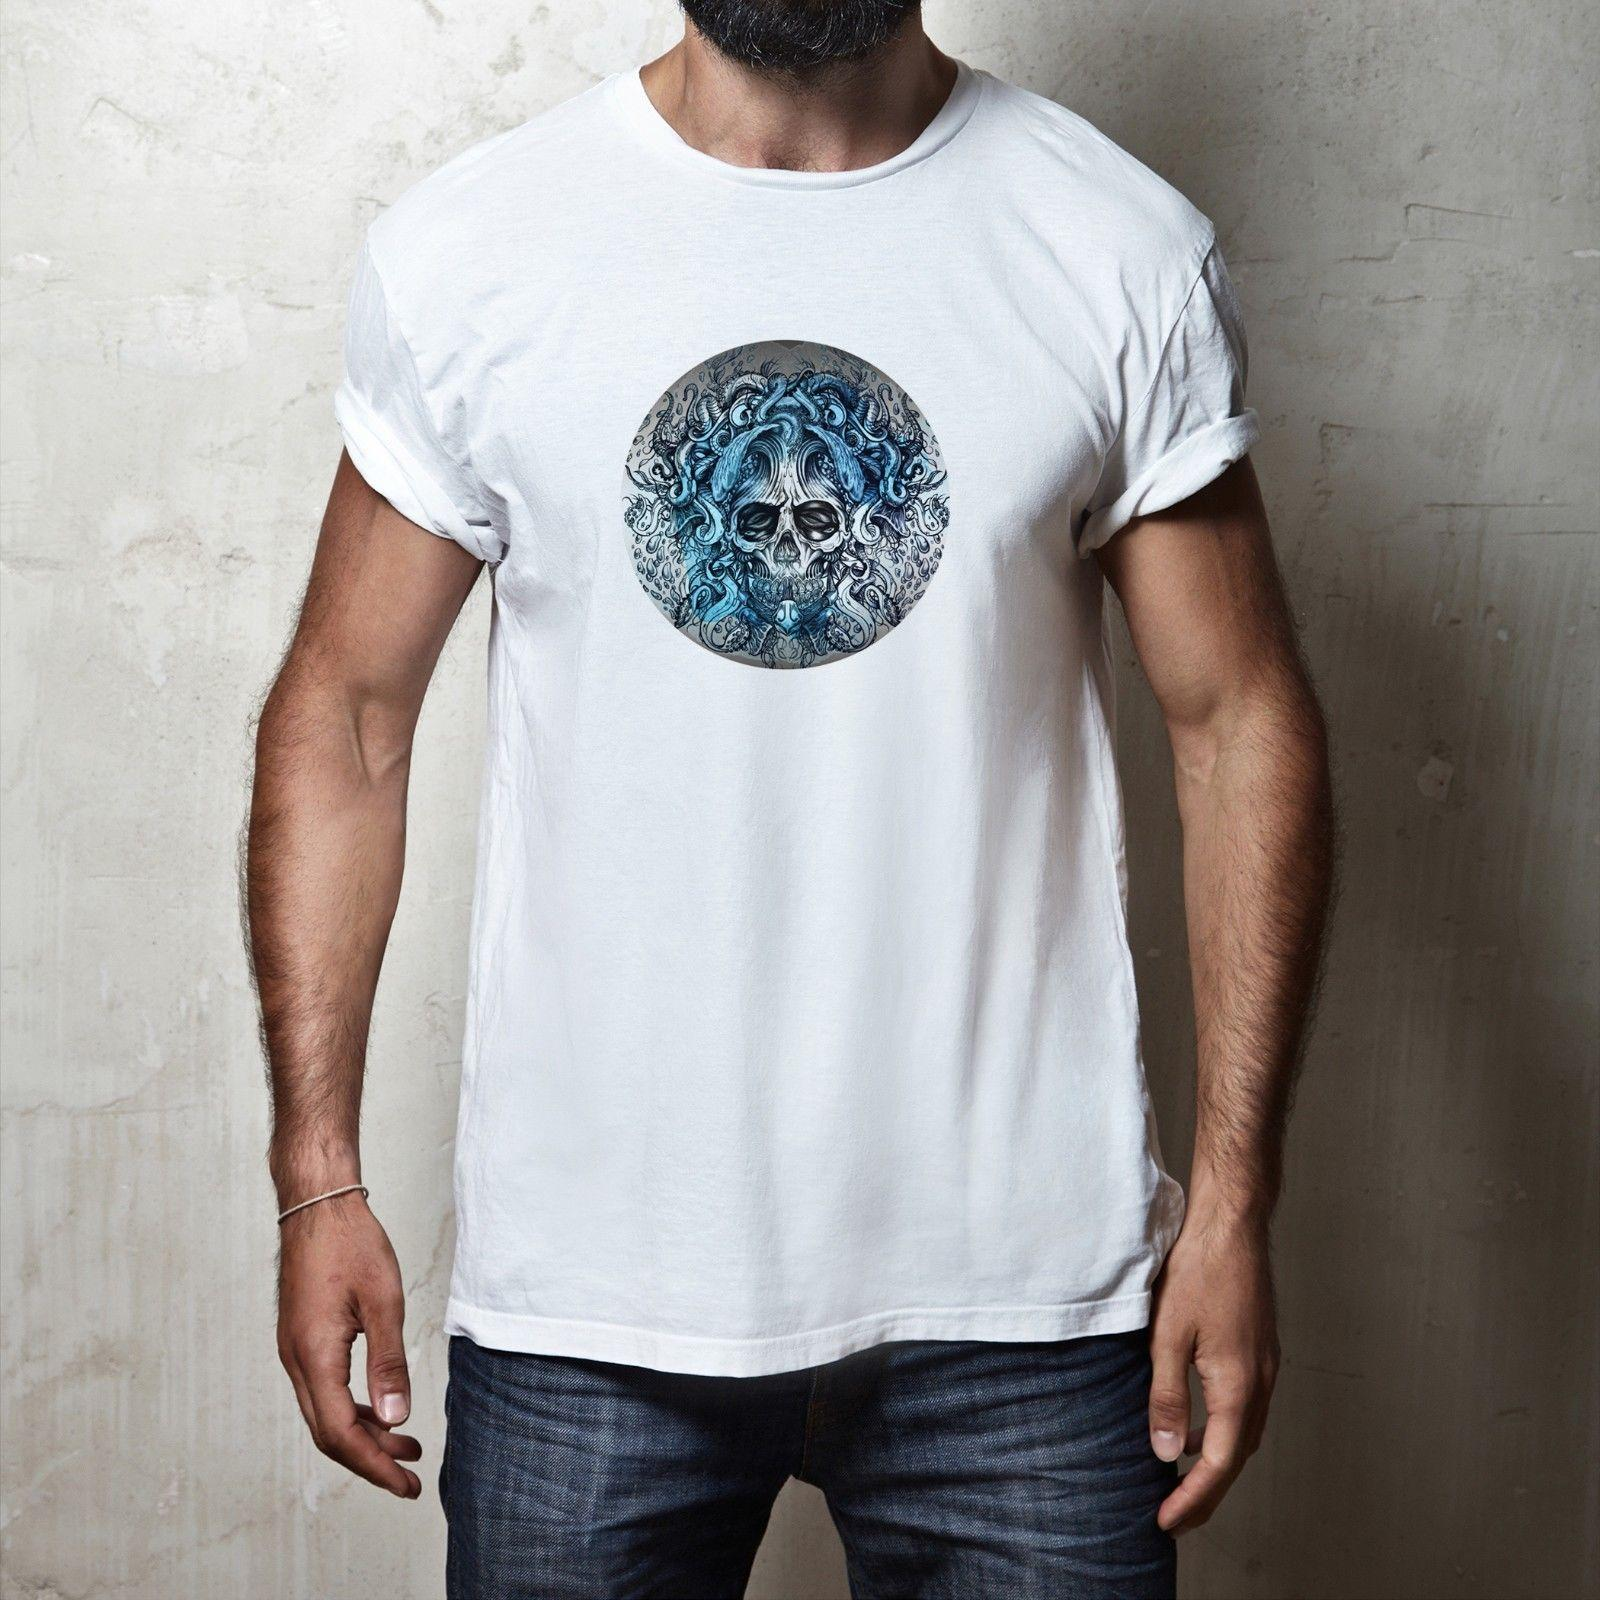 e614deb27 Mens Fit Sea Octopus Ocean Tentacle Skull Tattoo Art Style Fashion T Shirt  Tee Rude T Shirt Shirt With T Shirt From Yvettestore, $24.2| DHgate.Com